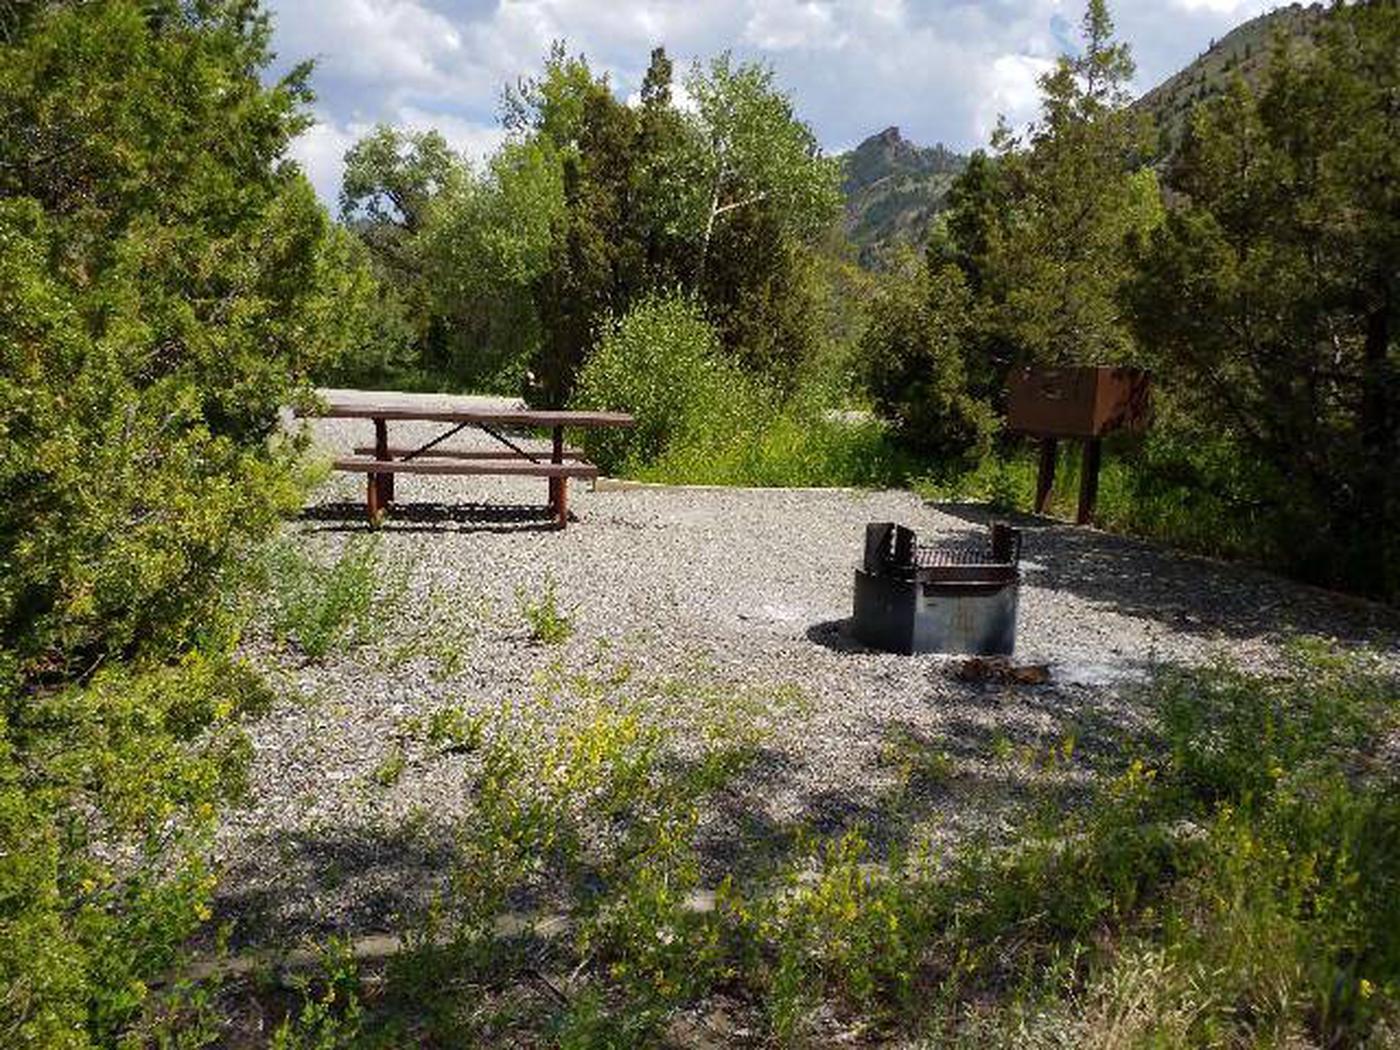 Wapiti Campsite 4 - Back View